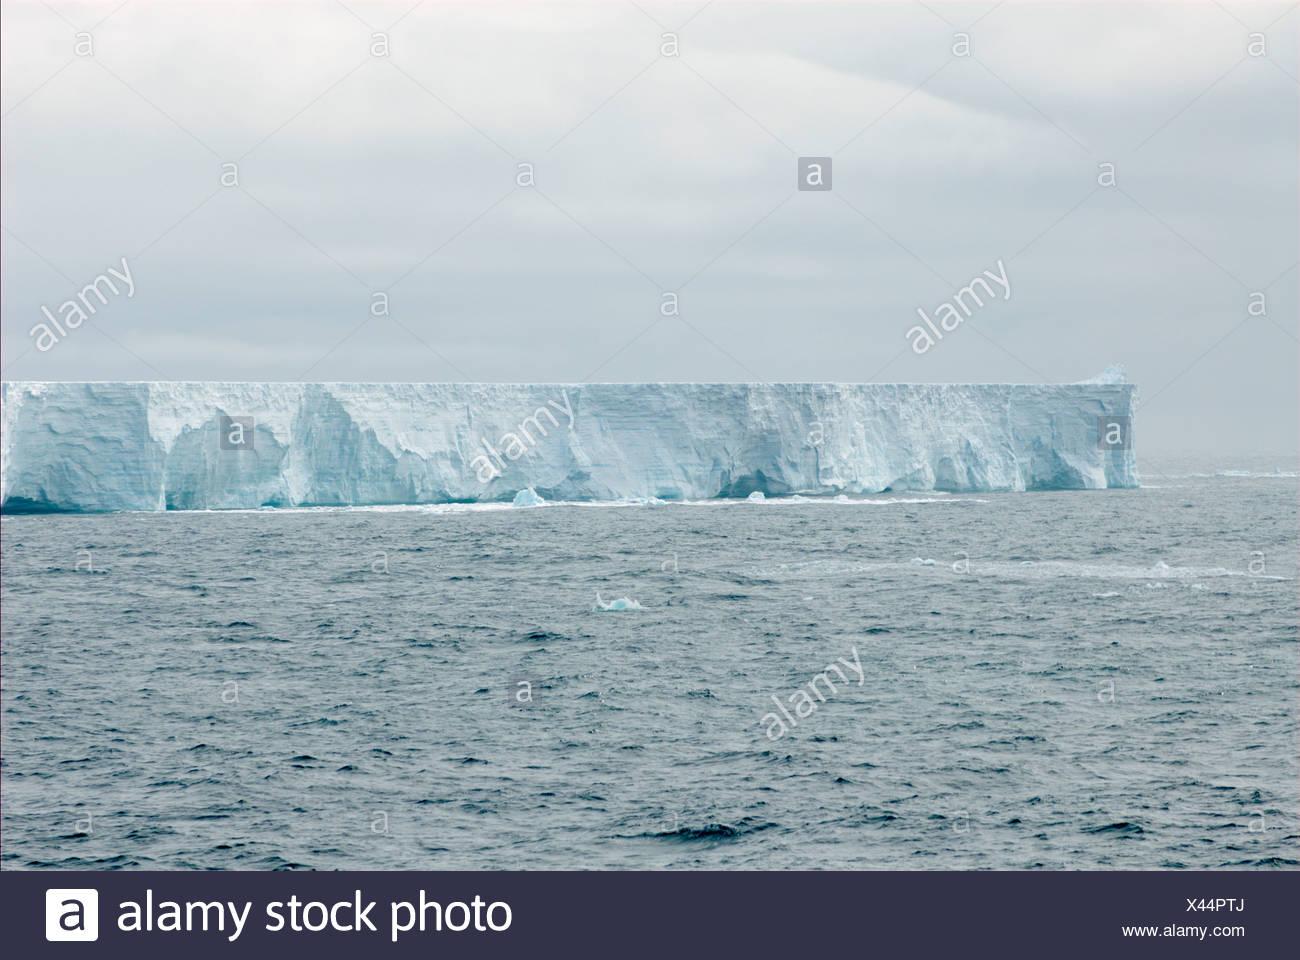 Iceberg in the southern Atlantic ocean - Stock Image